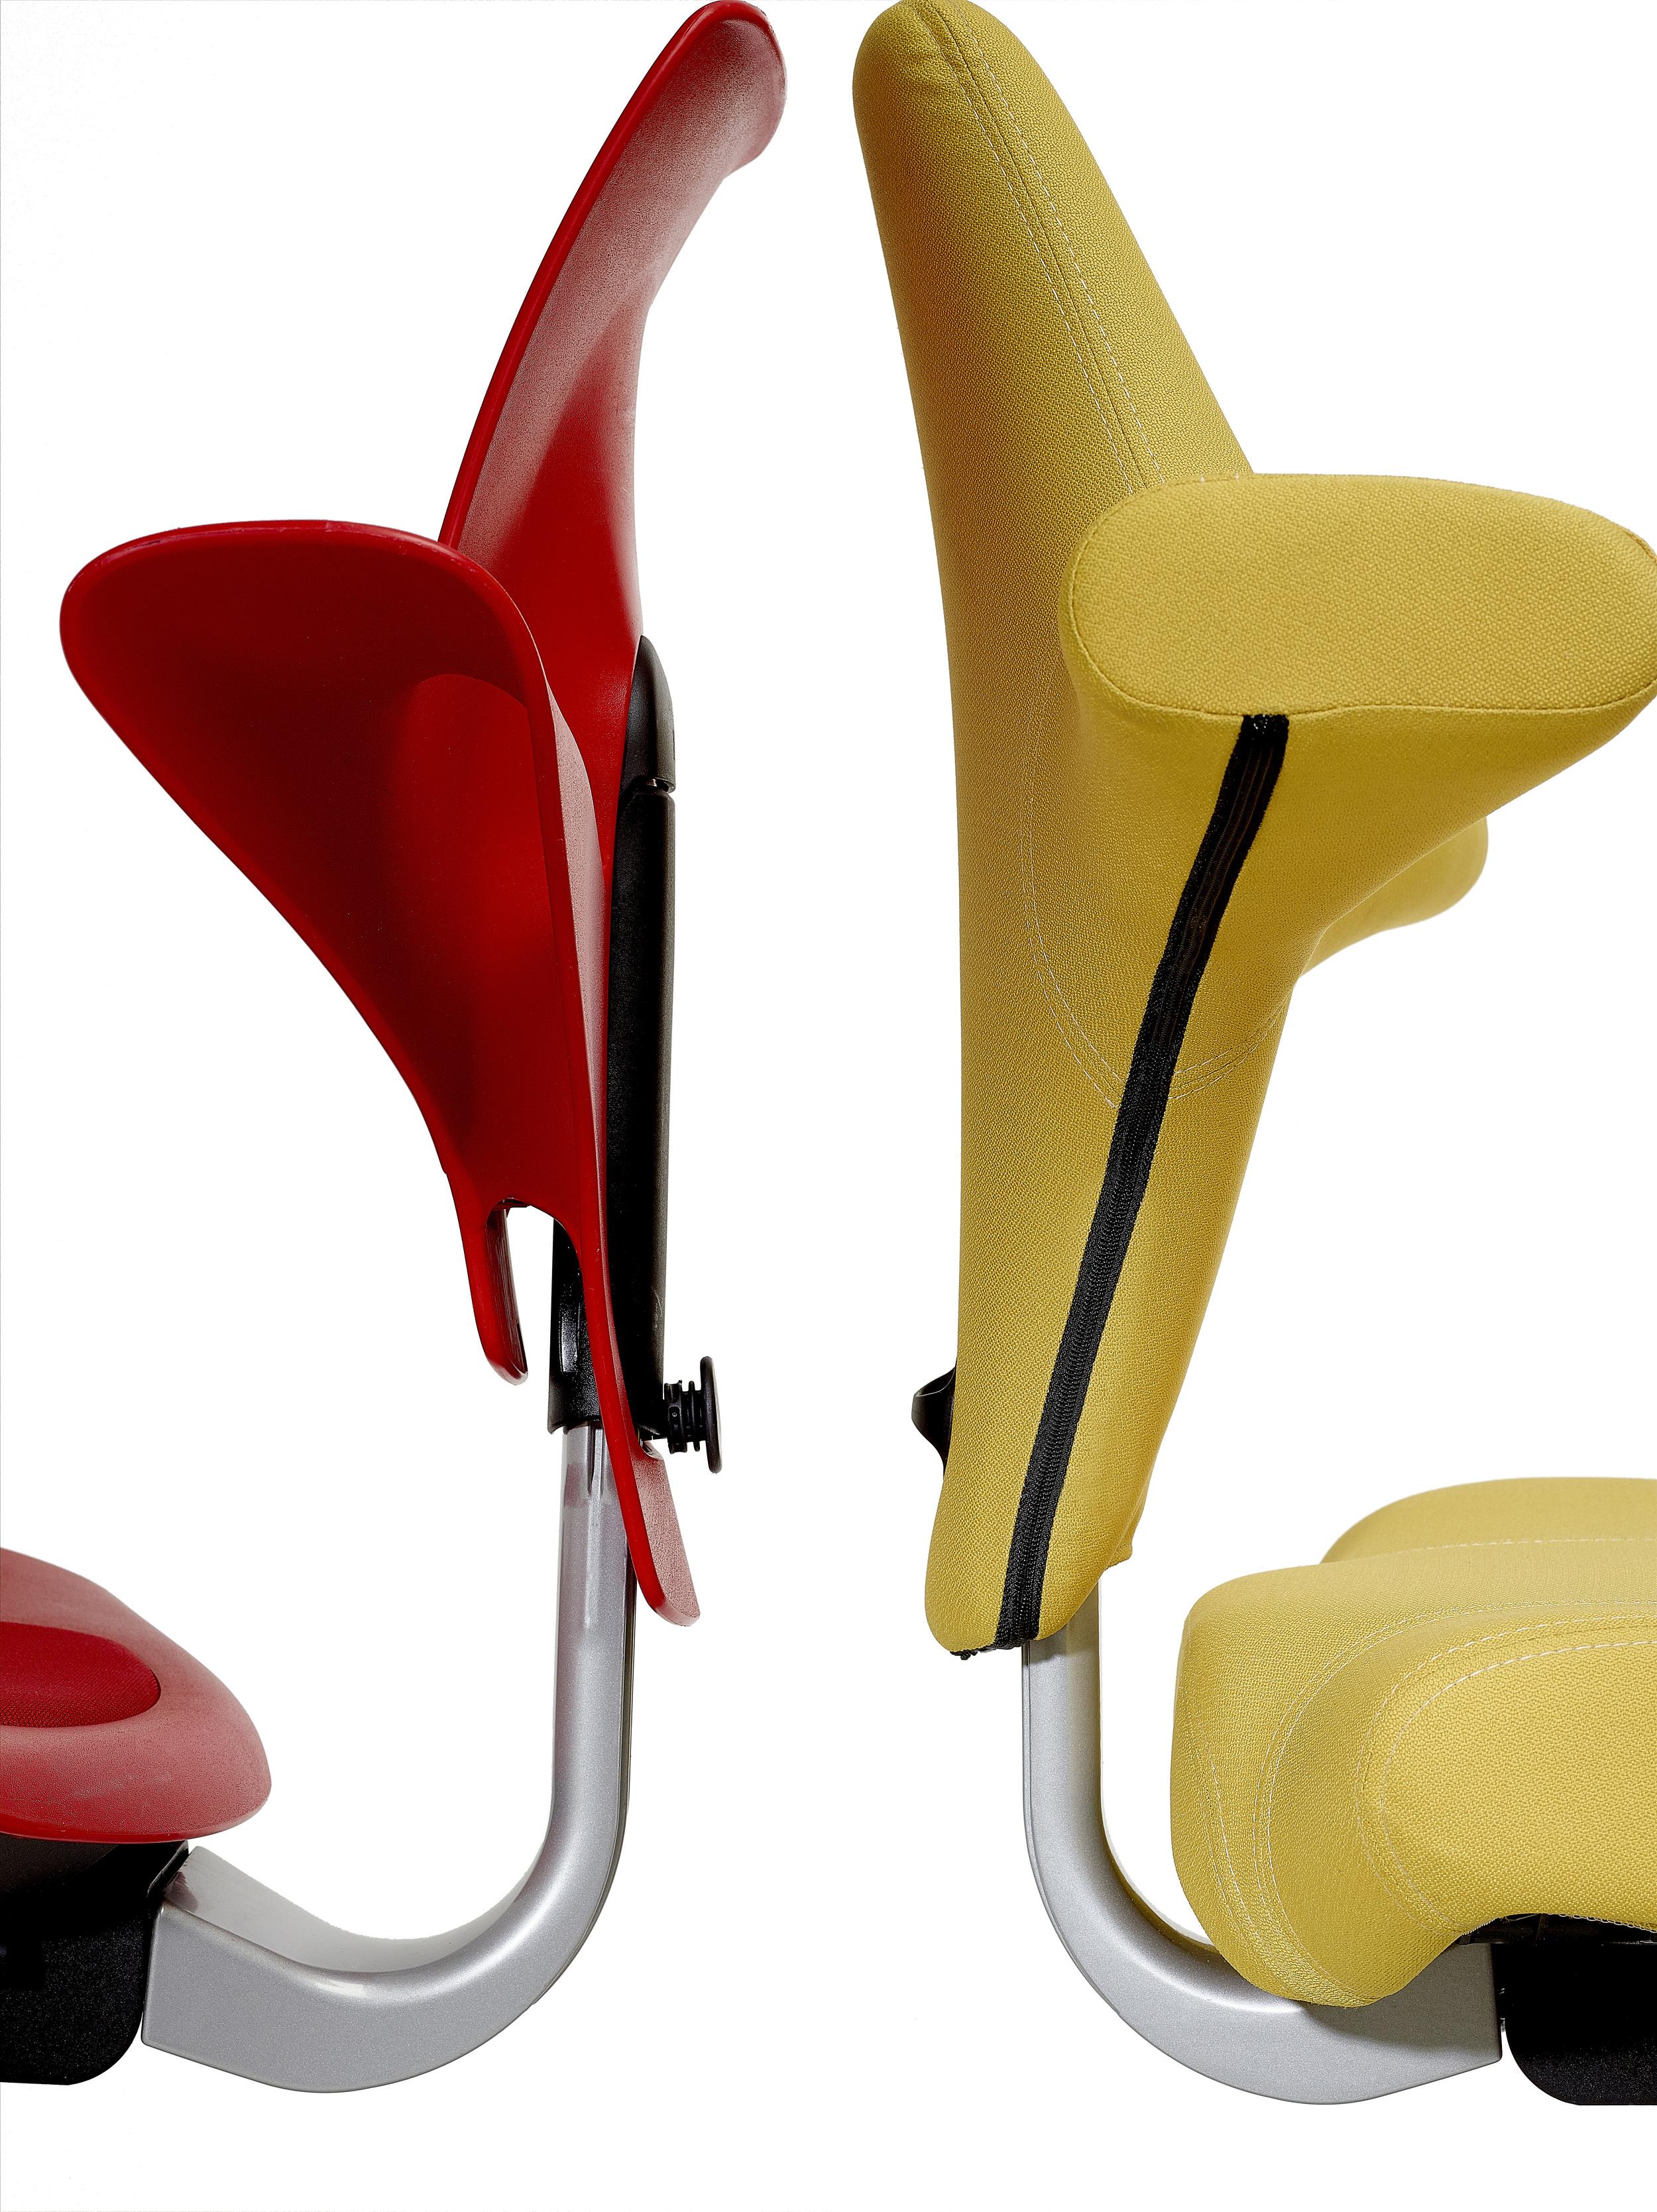 furniture43399.jpg